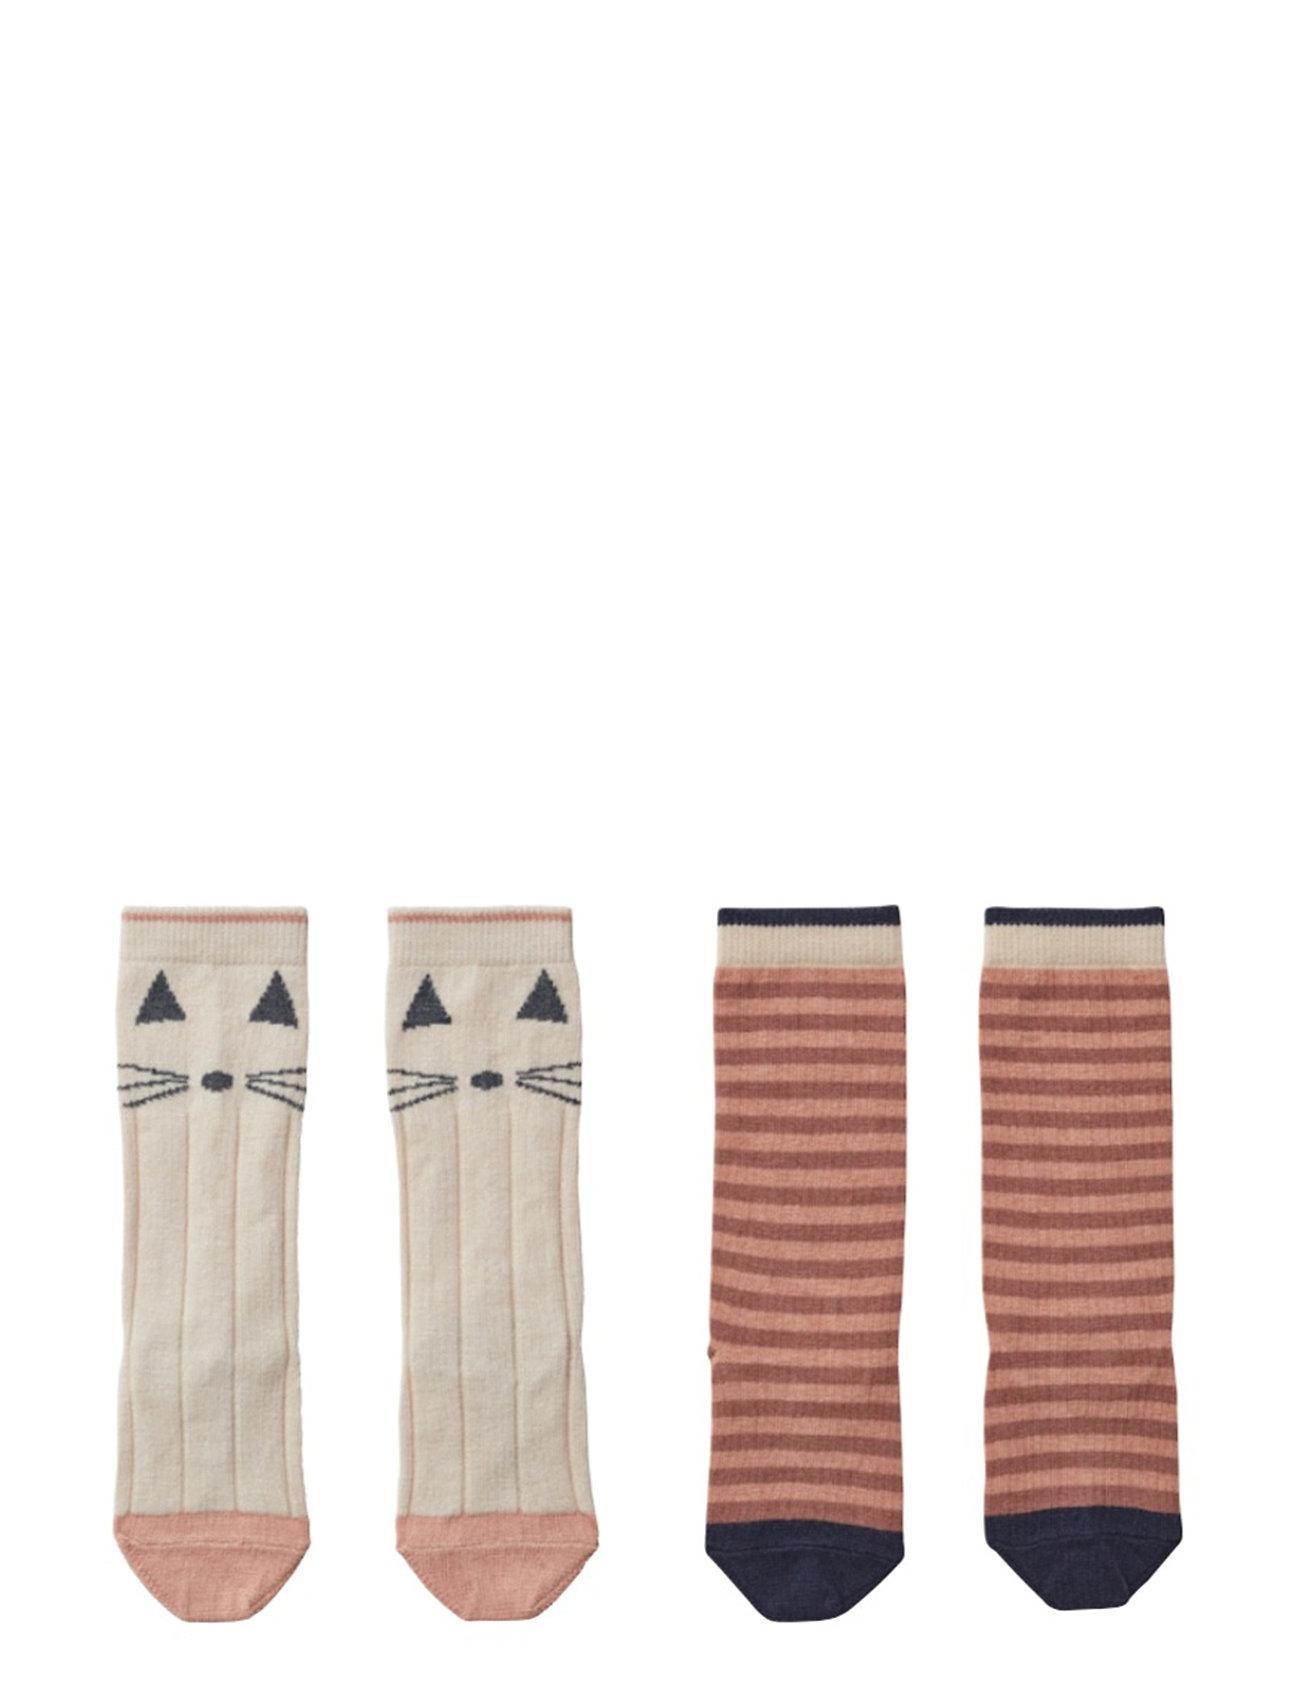 Liewood Sofia cotton knee socks - 2 pack - CAT/STRIPE CORAL BLUSH